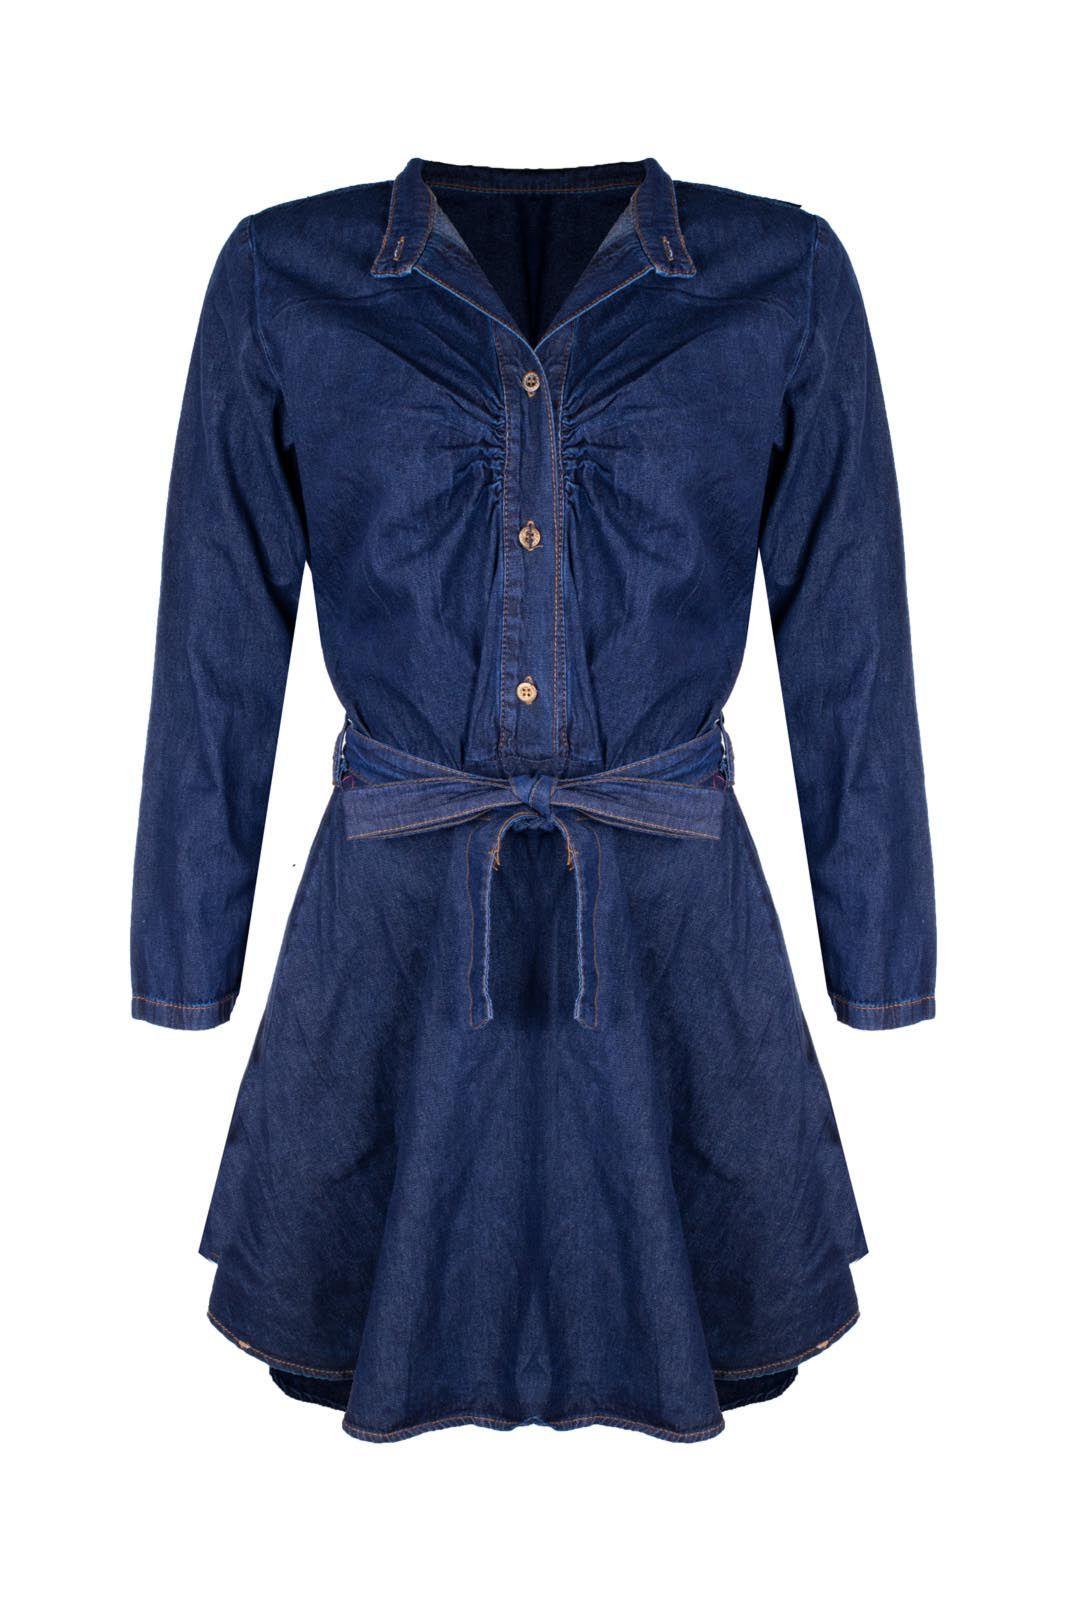 Vestido Outlet Dri Jeans Manga Longa Rodado Gola Padre 4 Botões Frontal Índigo